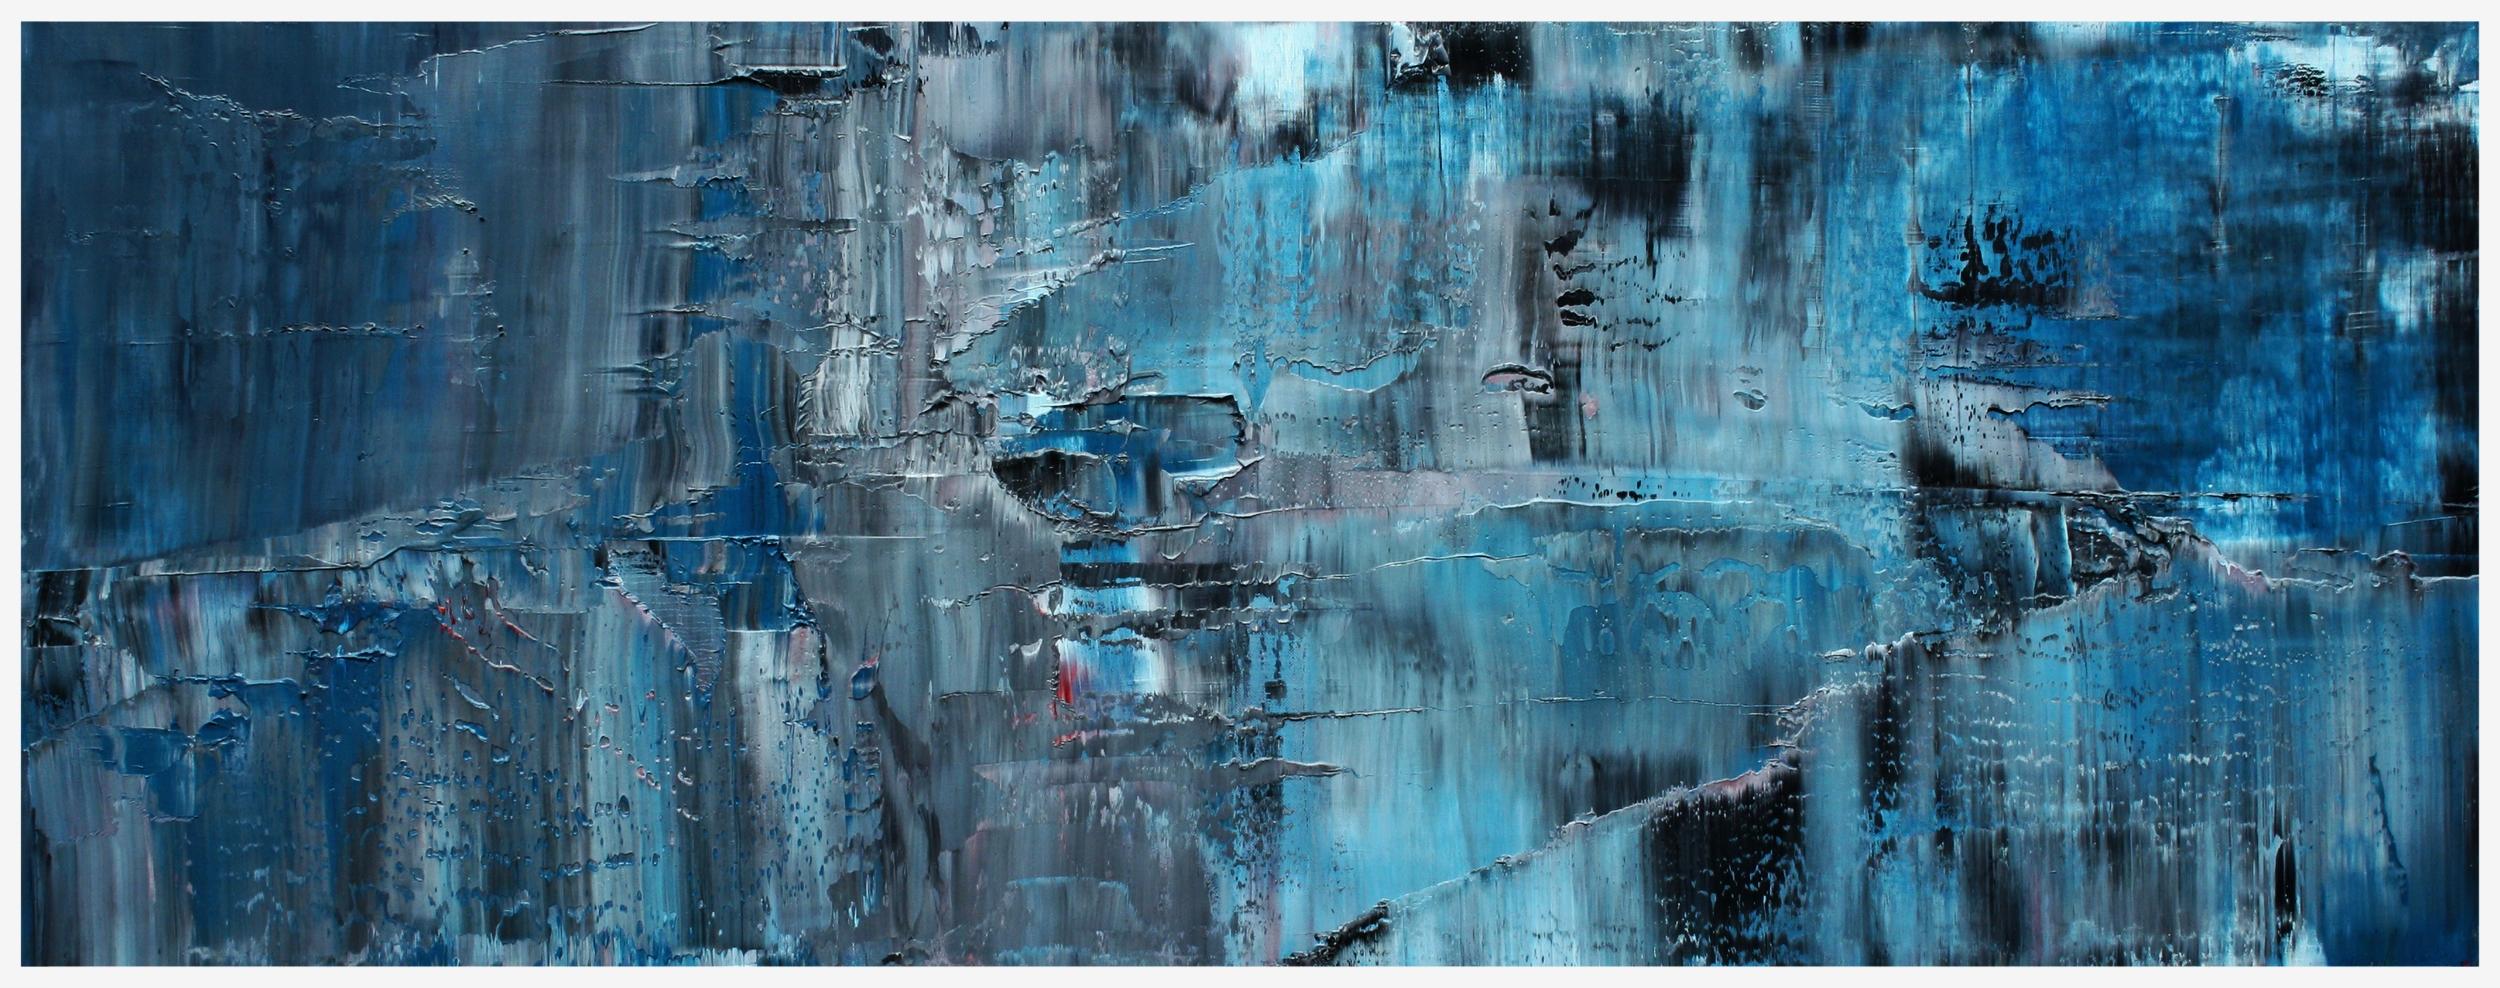 """  Reflets dans l'eau  ""  ©ANTHONY WIGGLESWORTH 2015"